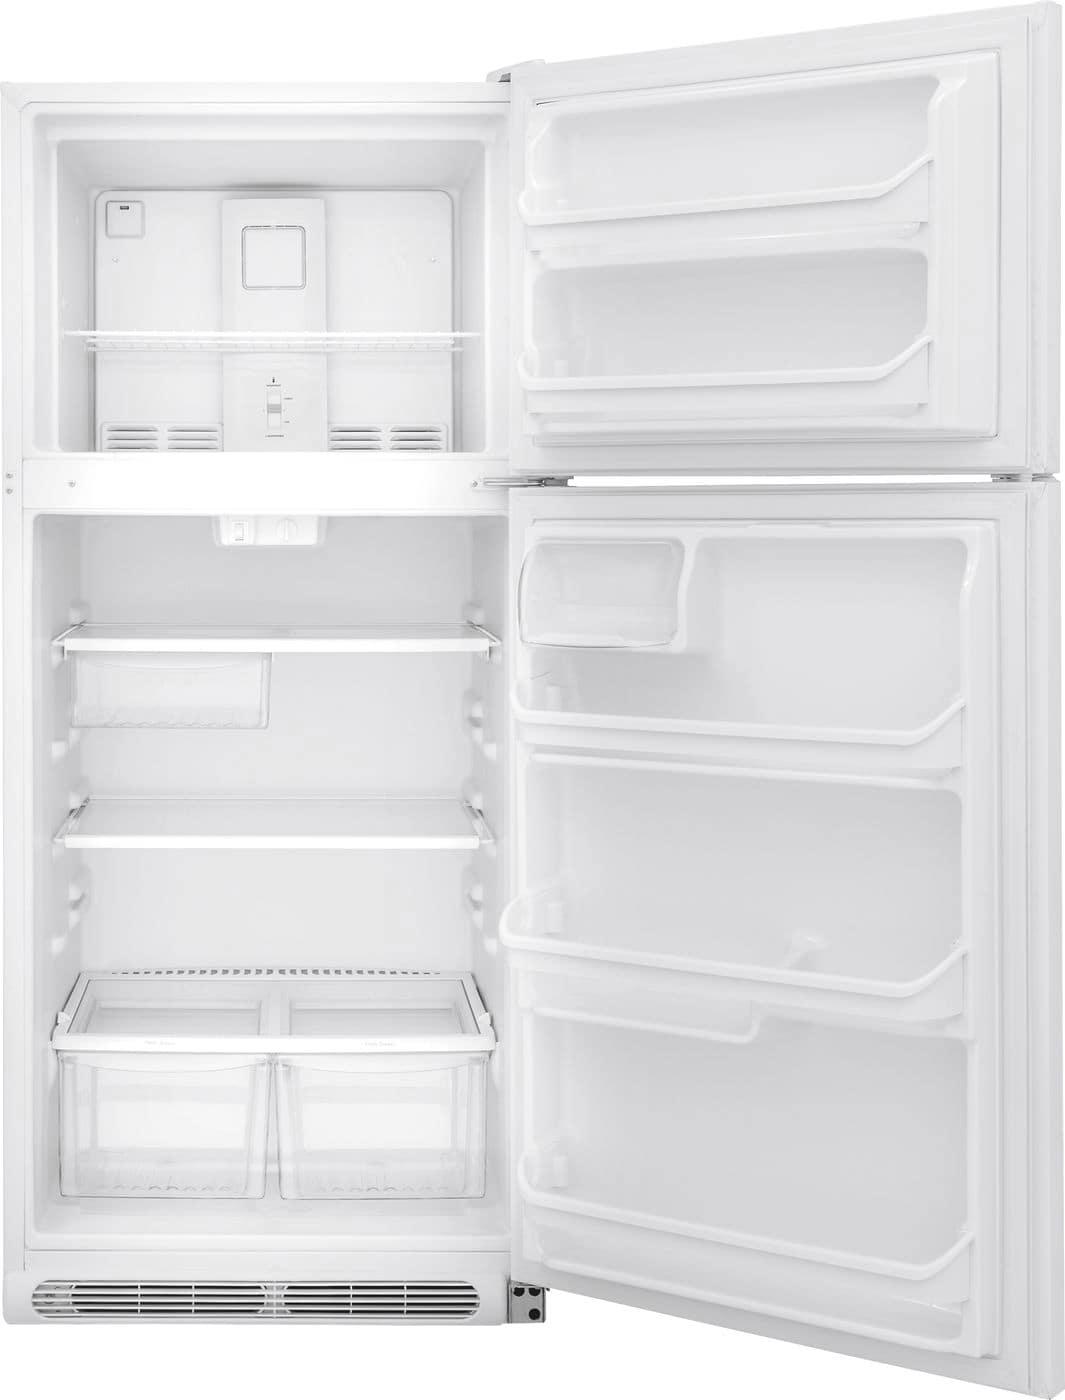 Model: FFTR2021TW | Frigidaire 20.4 Cu. Ft. Top Freezer Refrigerator